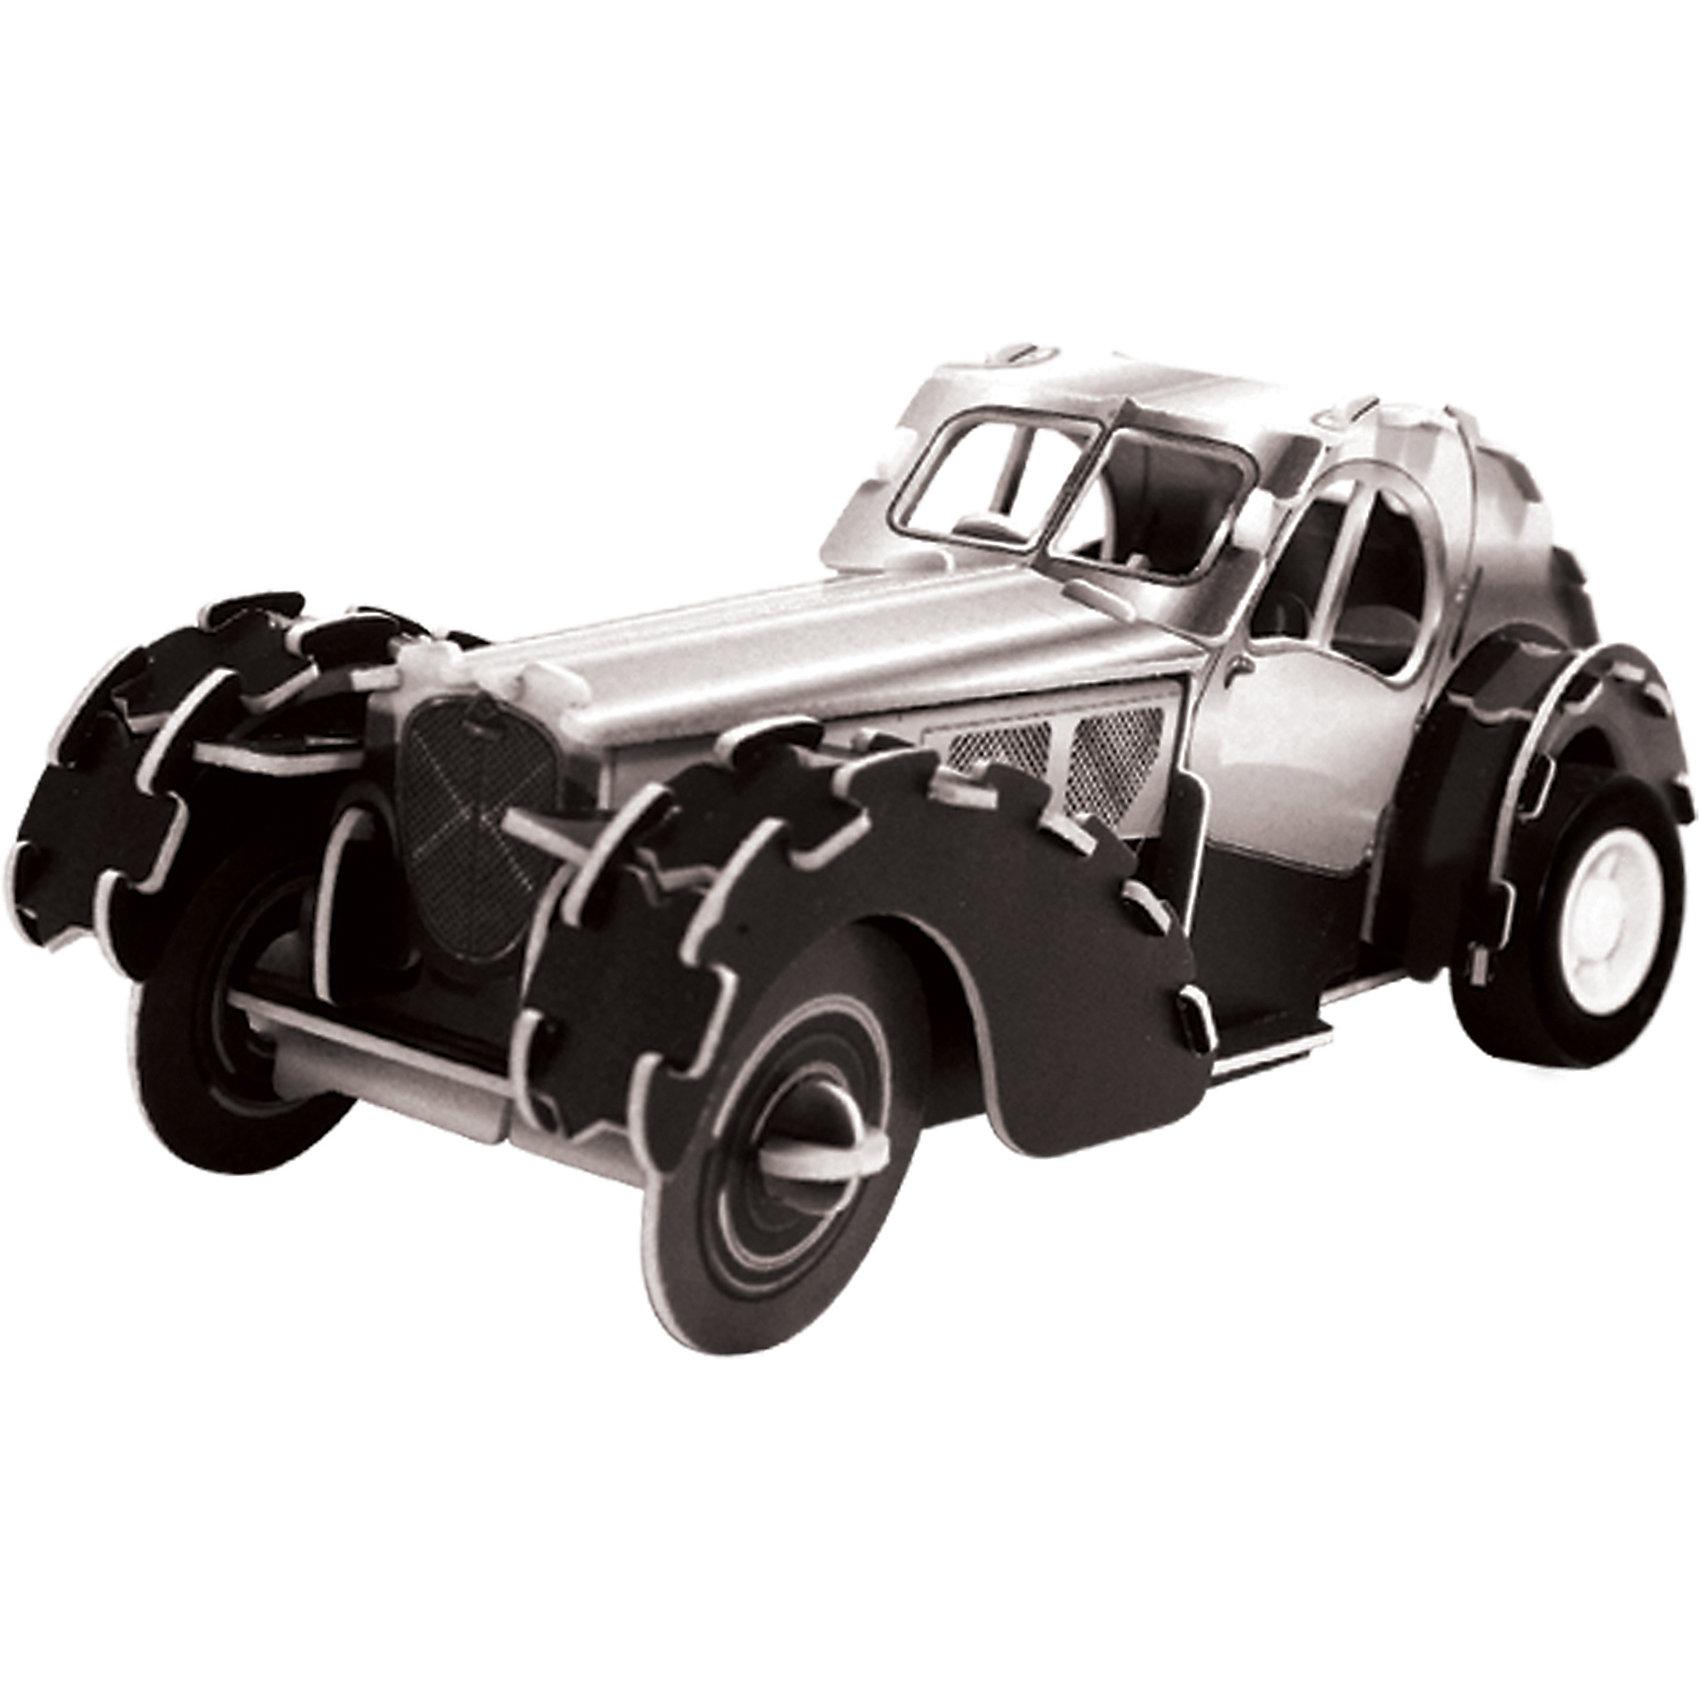 3D Пазл Ретро автомобиль 57SC Coupe инерционный, 67 деталей<br><br>Ширина мм: 160<br>Глубина мм: 35<br>Высота мм: 110<br>Вес г: 110<br>Возраст от месяцев: 60<br>Возраст до месяцев: 120<br>Пол: Унисекс<br>Возраст: Детский<br>SKU: 4800760